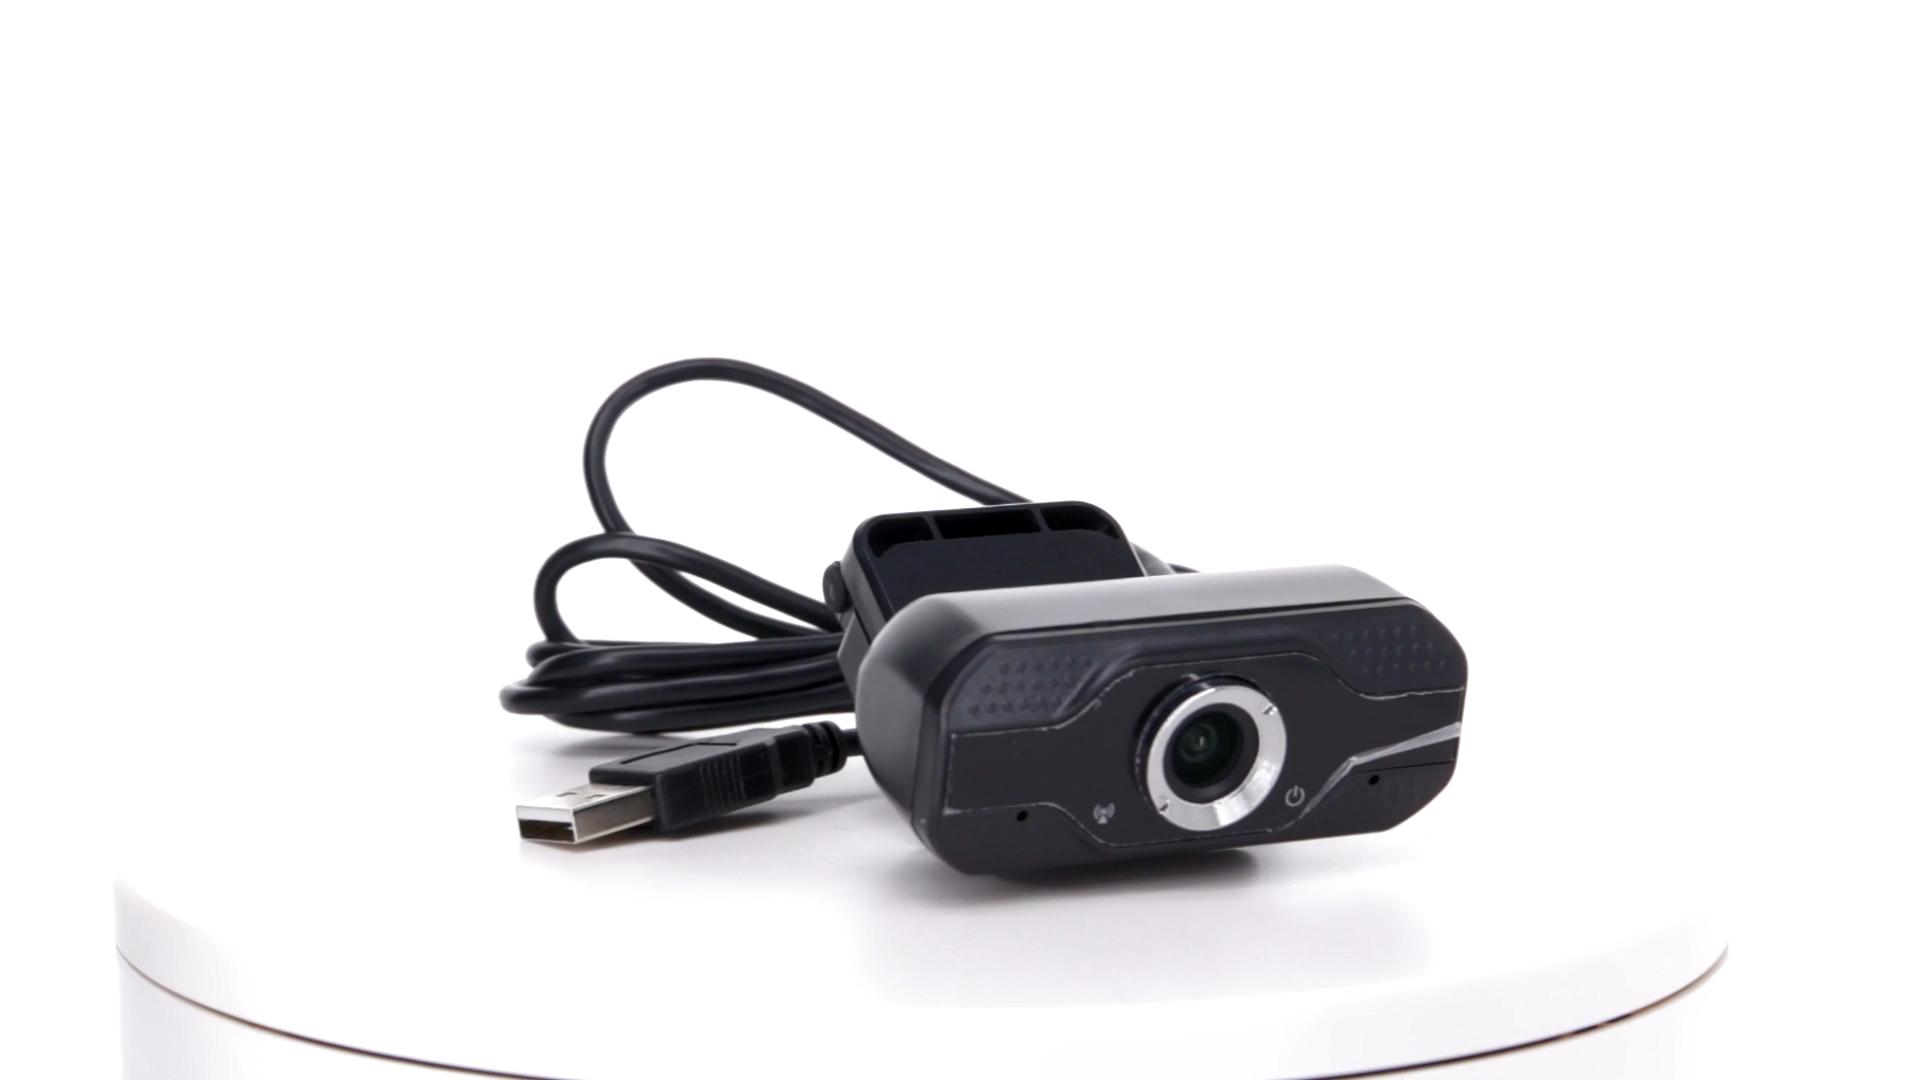 Hot Sale Hd Web Camera WebCam For Laptop Computer